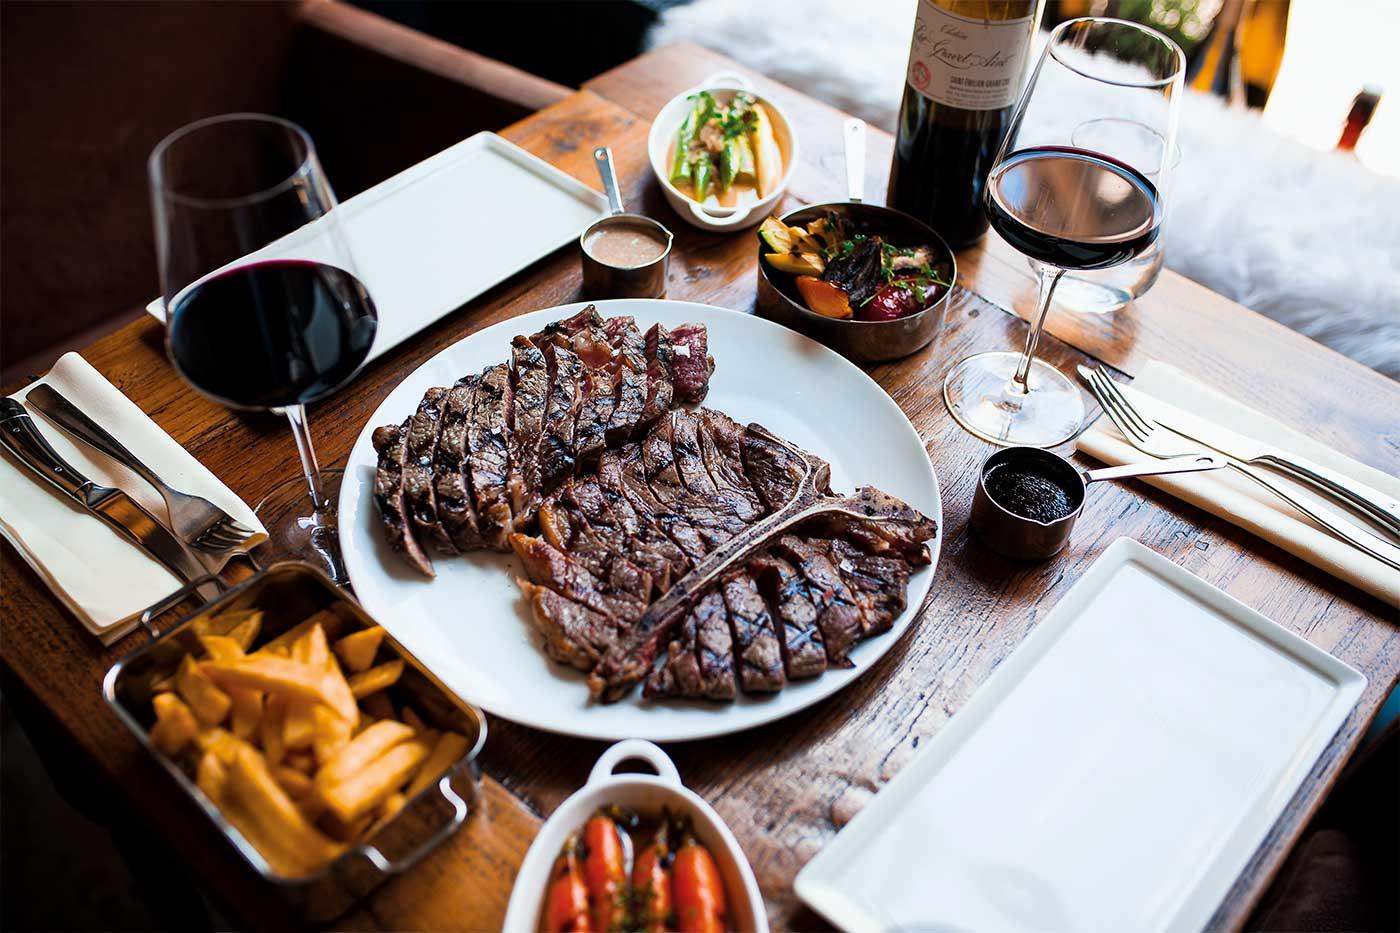 Degustation dinner beef steaks and wine